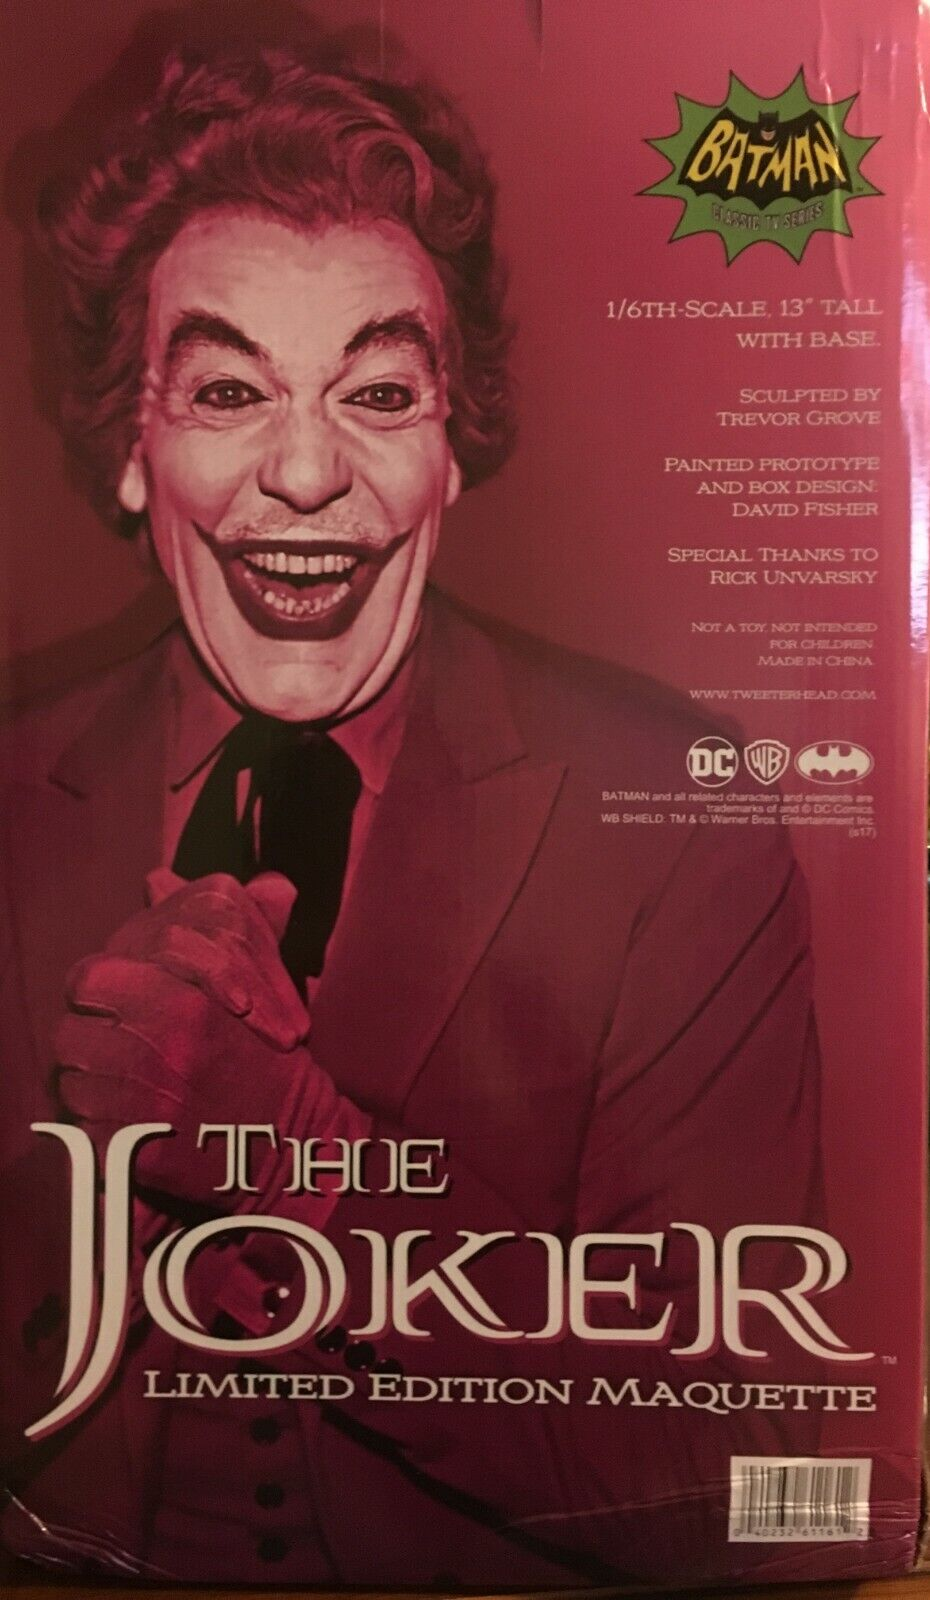 THE JOKER 1966 Maquette Classic Batman TV Show Tweeterhead 902789 NIB Sideshow